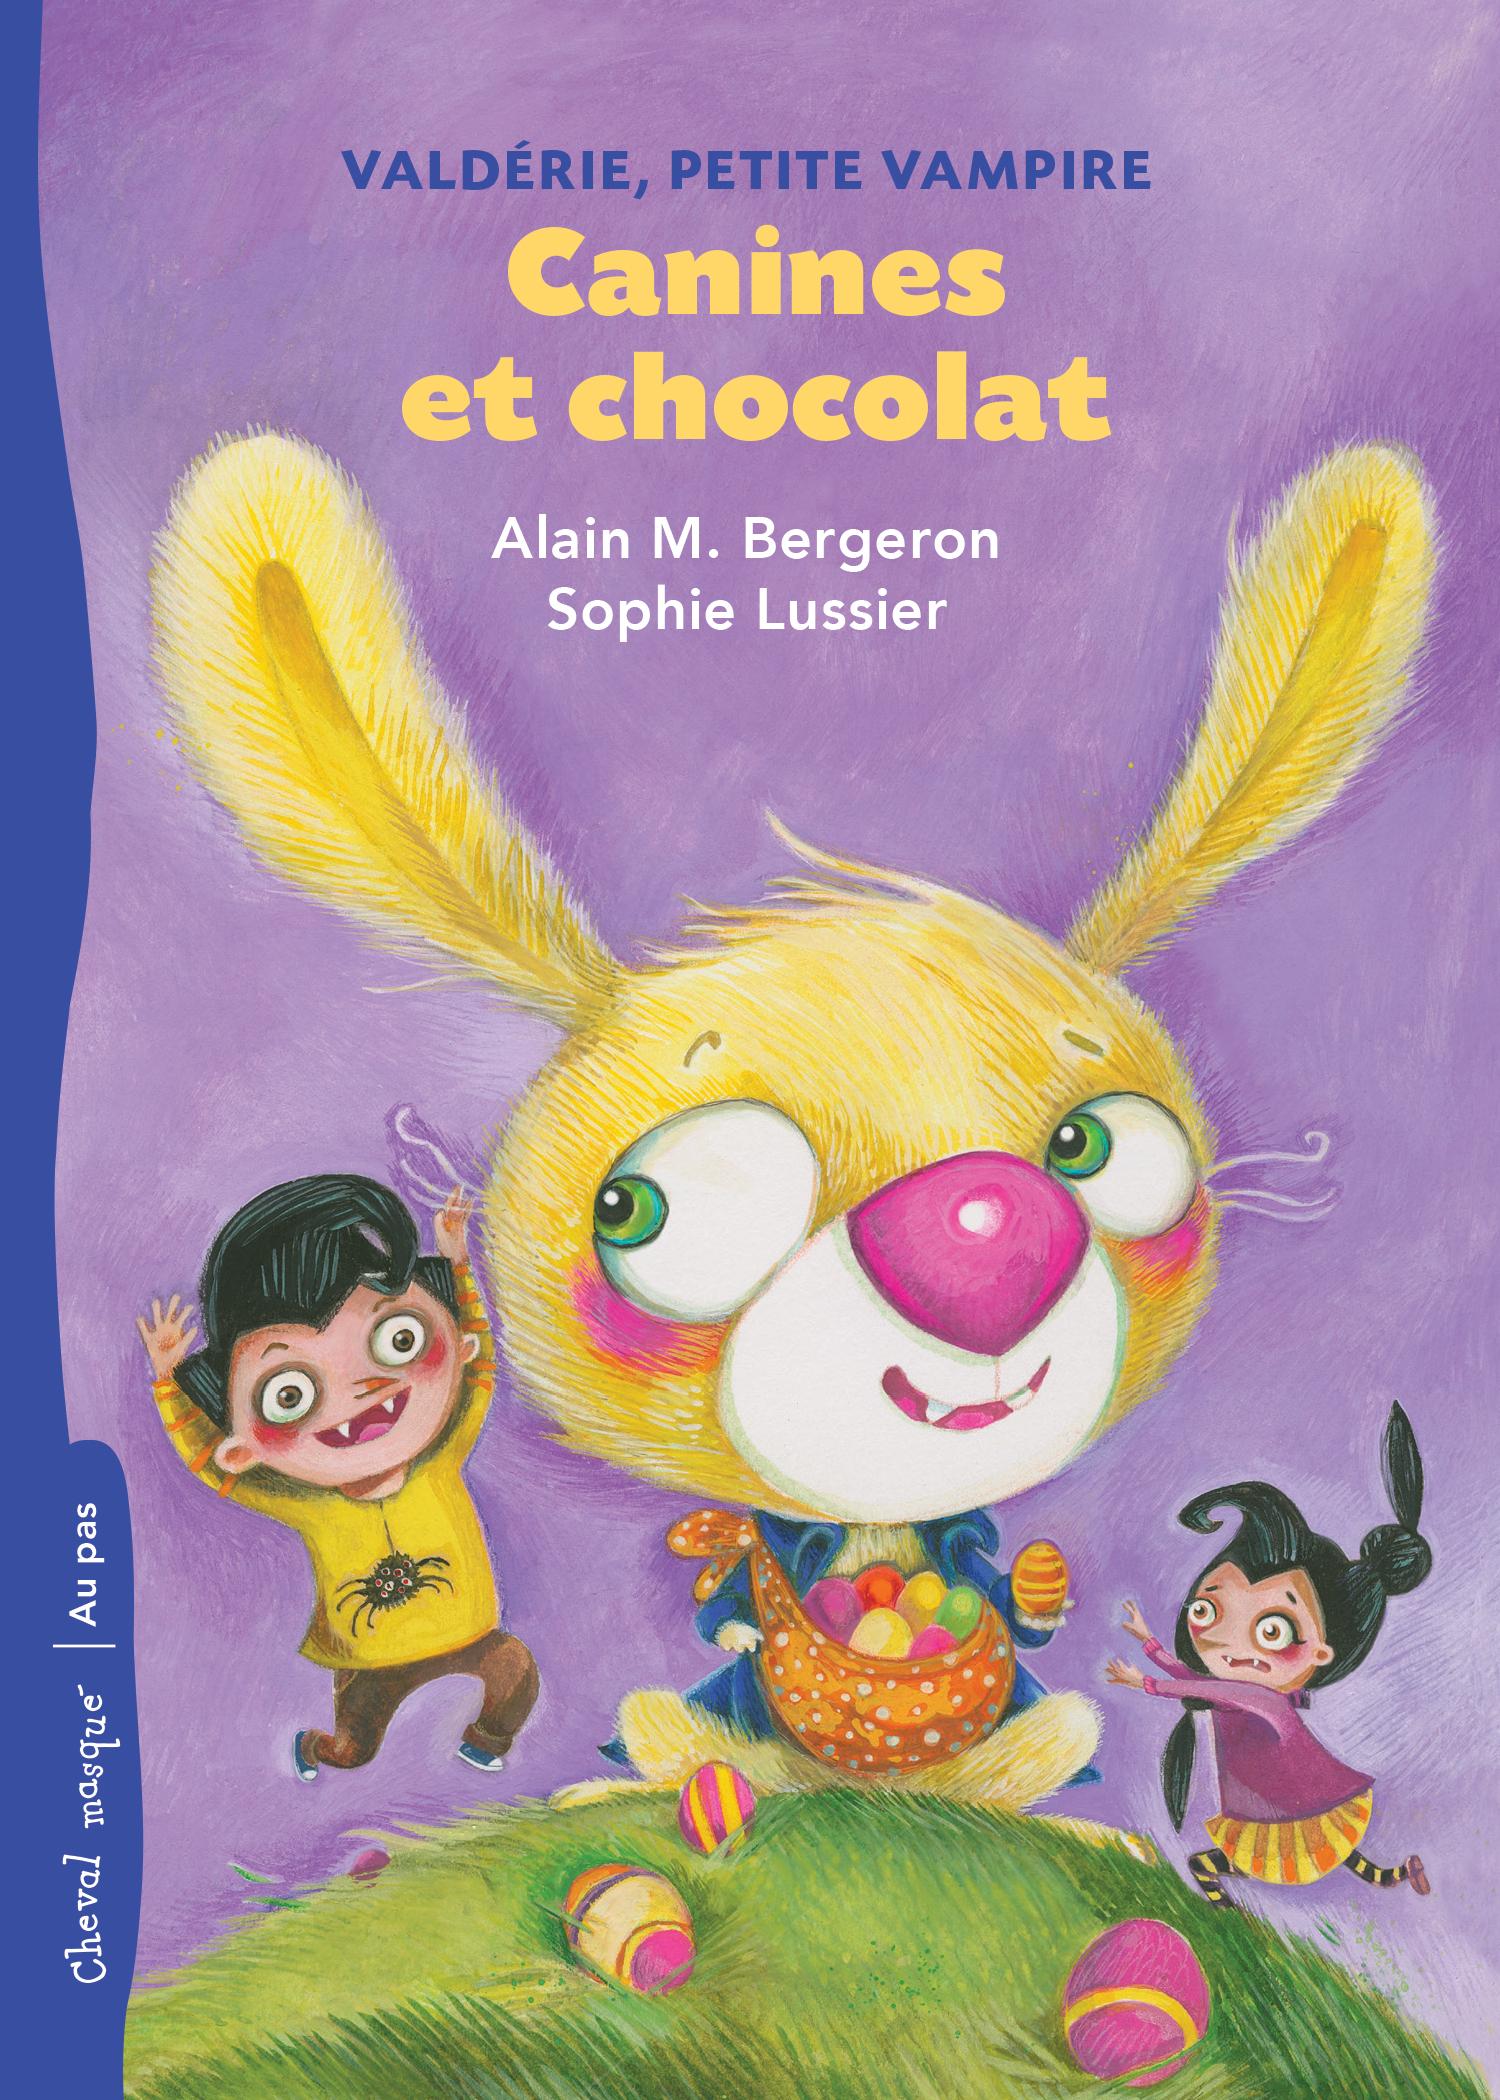 Canines et chocolat : Valdérie, petite vampire – no.4